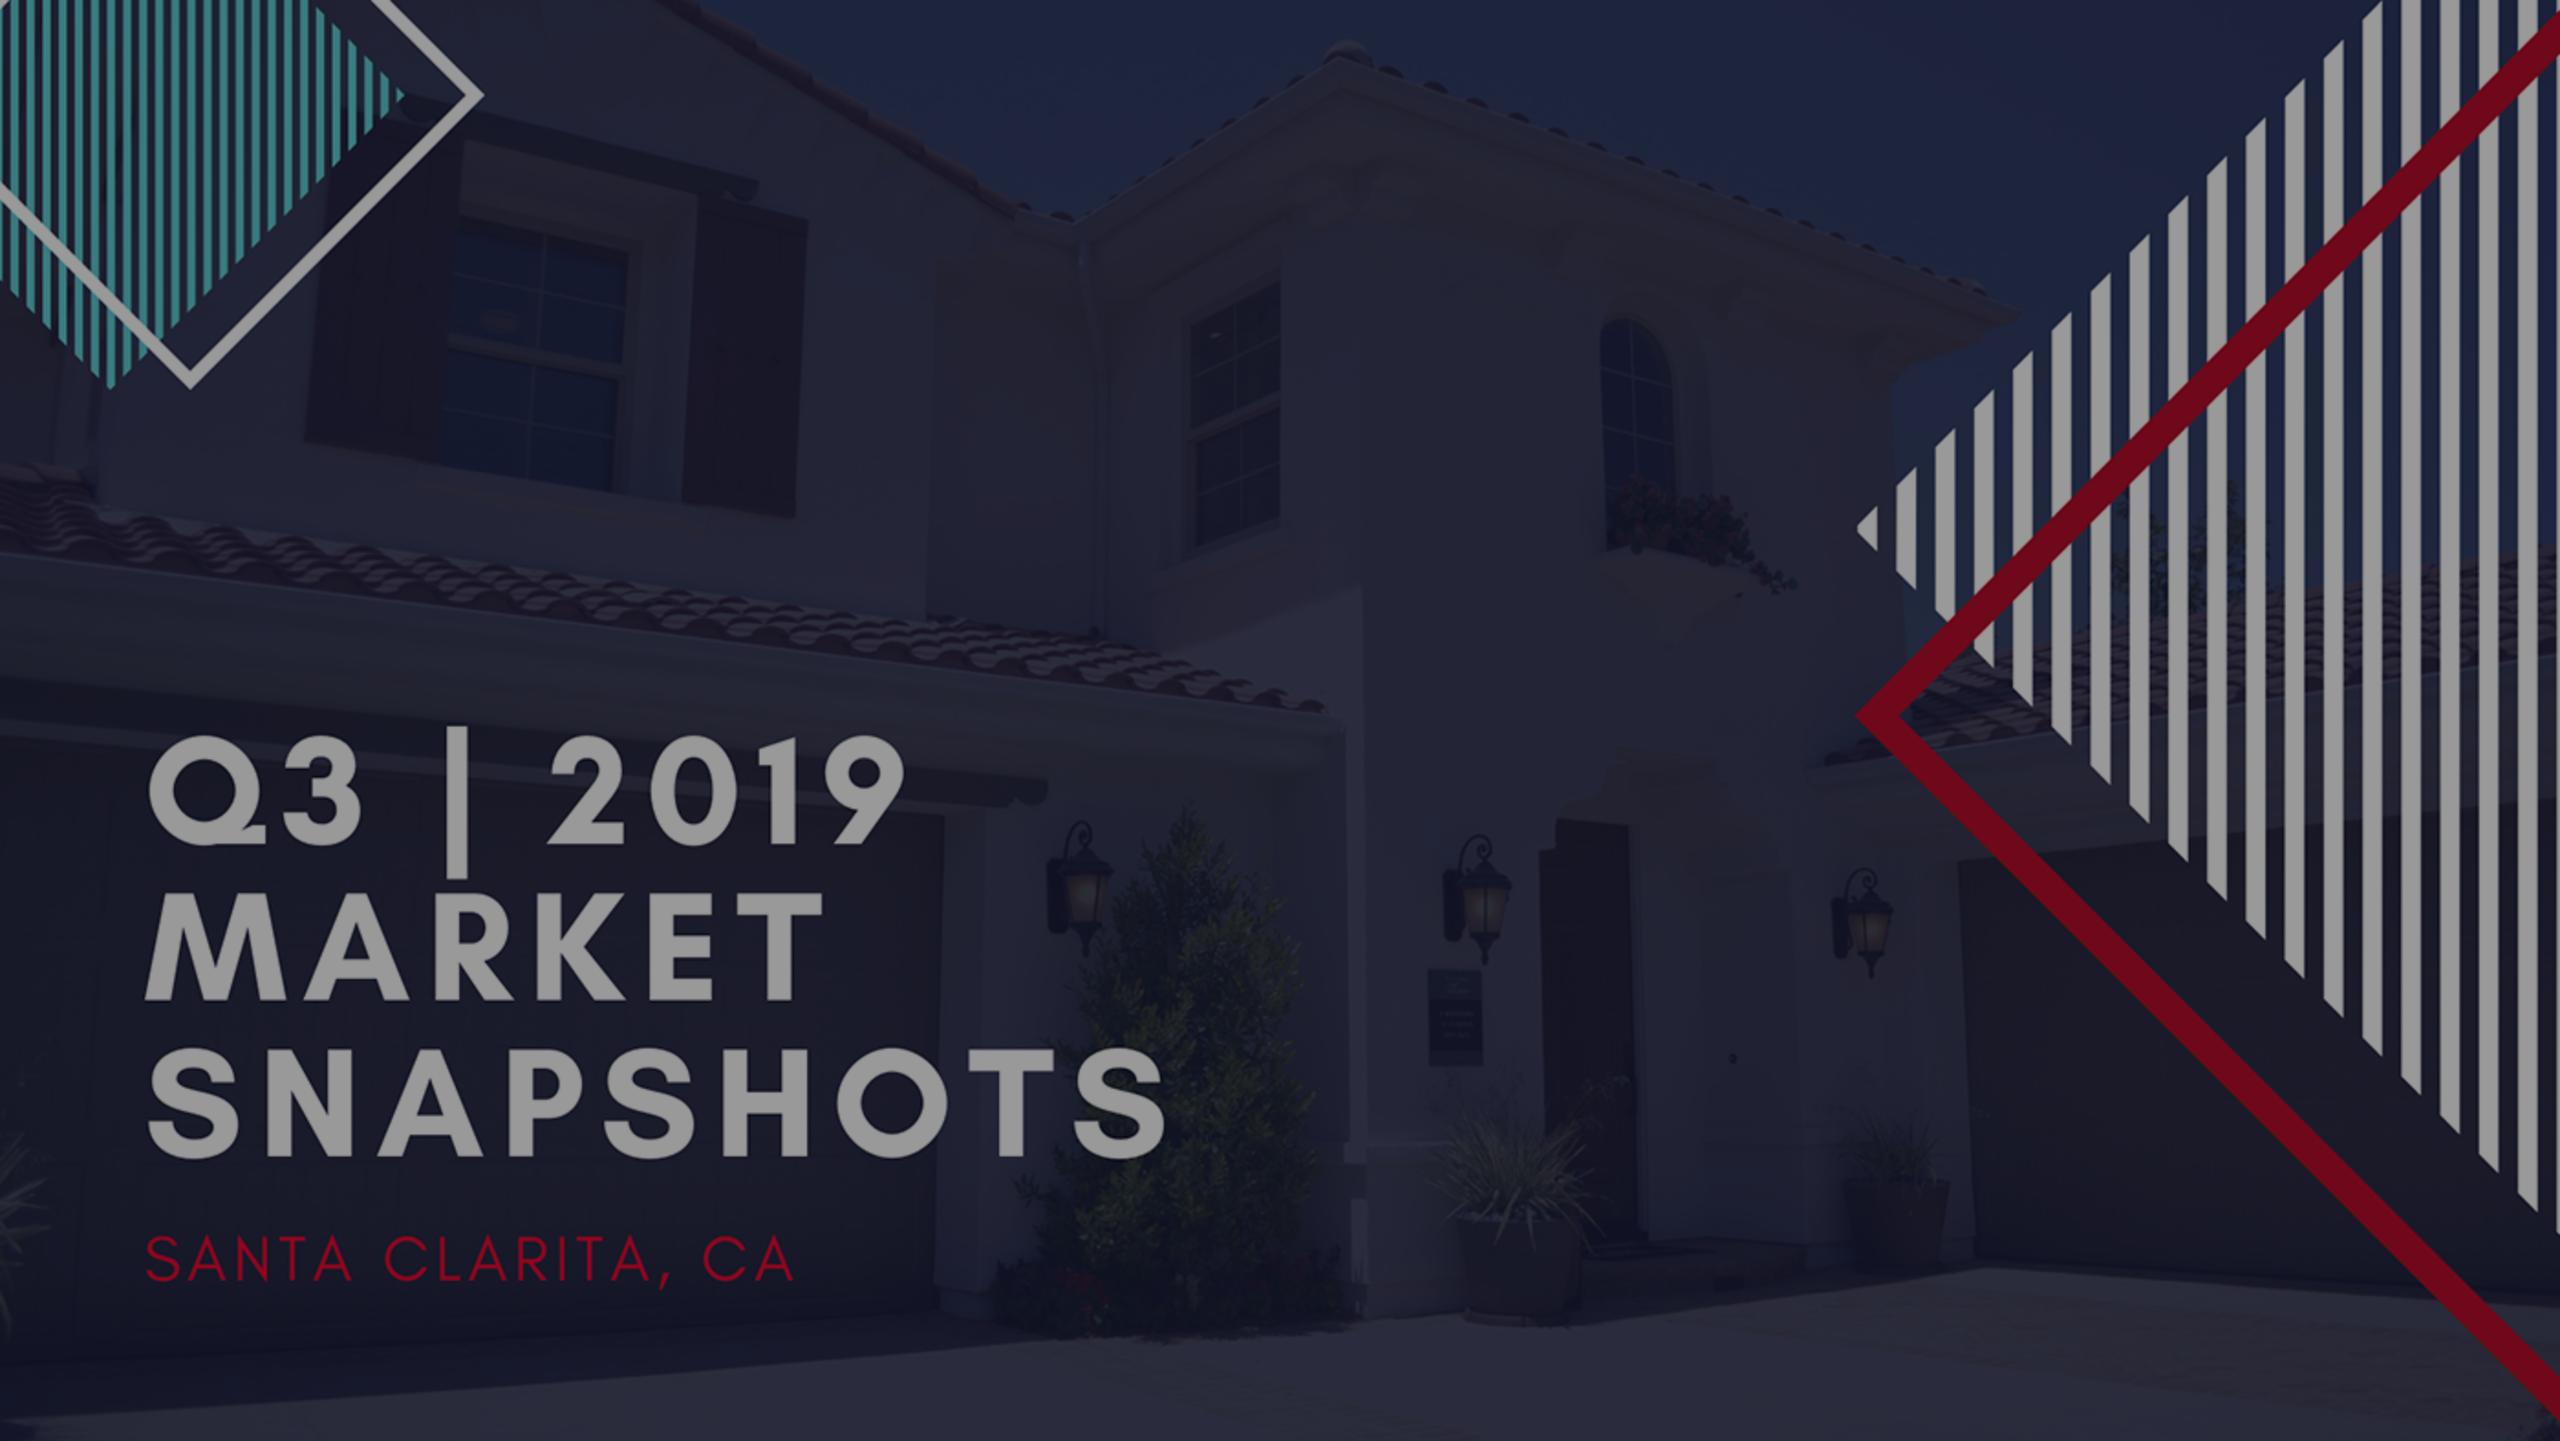 Q3 | 2019 -Real Estate Market Snapshots of Santa Clarita, Ca